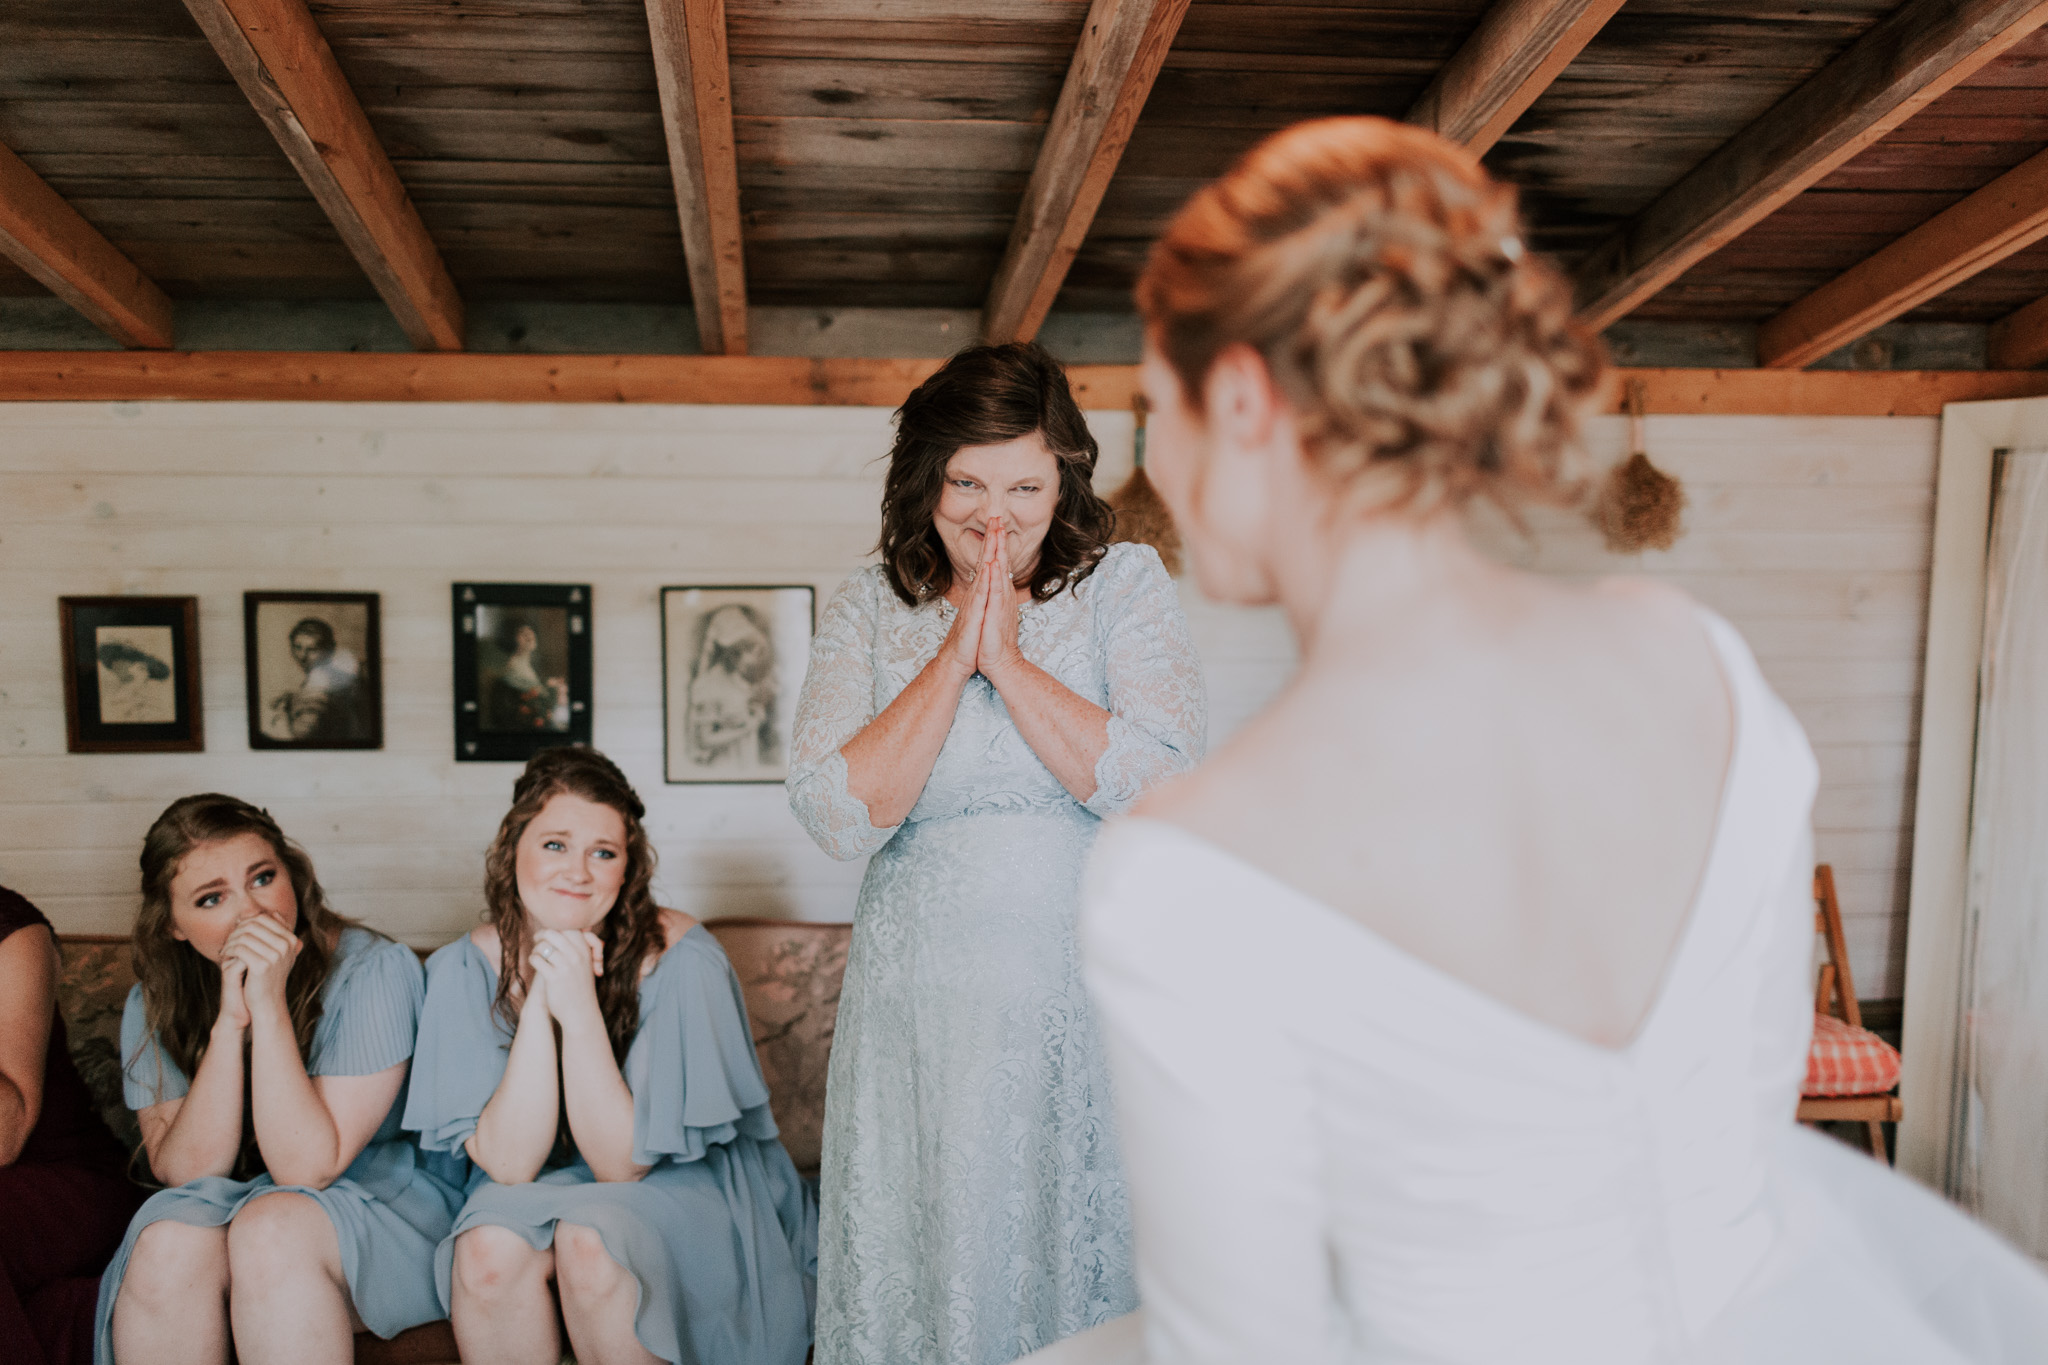 MillCreek-Wilde-Wedding-Barn-Michigan-Eliza-Eric-Vafa-Photo218.jpg